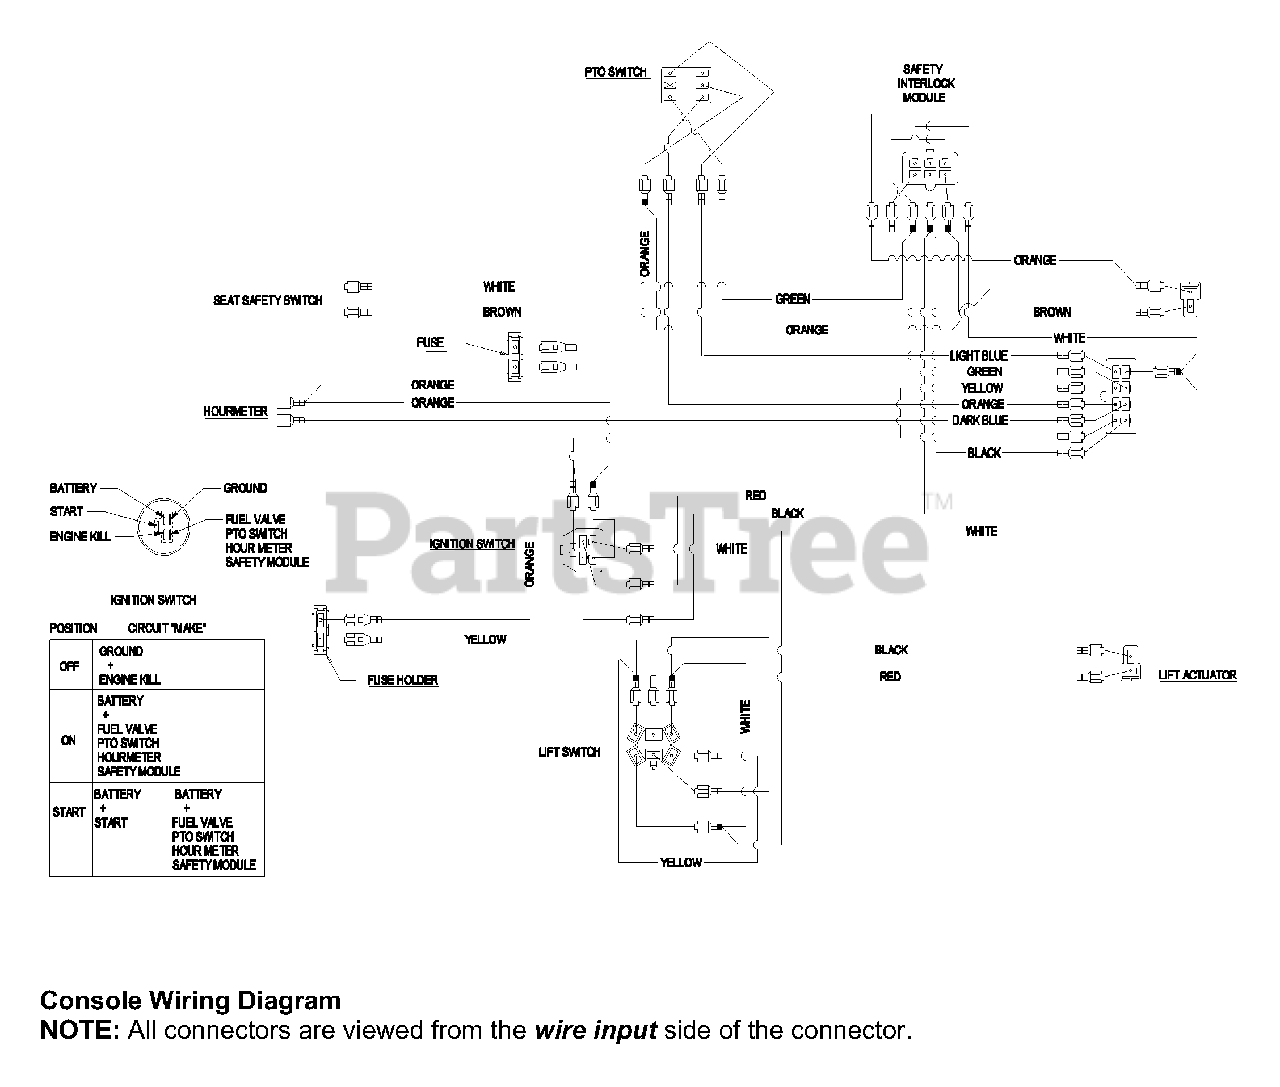 Exmark TR23KC - Exmark Turf Ranger Front Mount Mower, 23HP Kohler (SN:  440000 - 509999) (2004) Console Wiring Diagram Parts Lookup with Diagrams |  PartsTreePartsTree